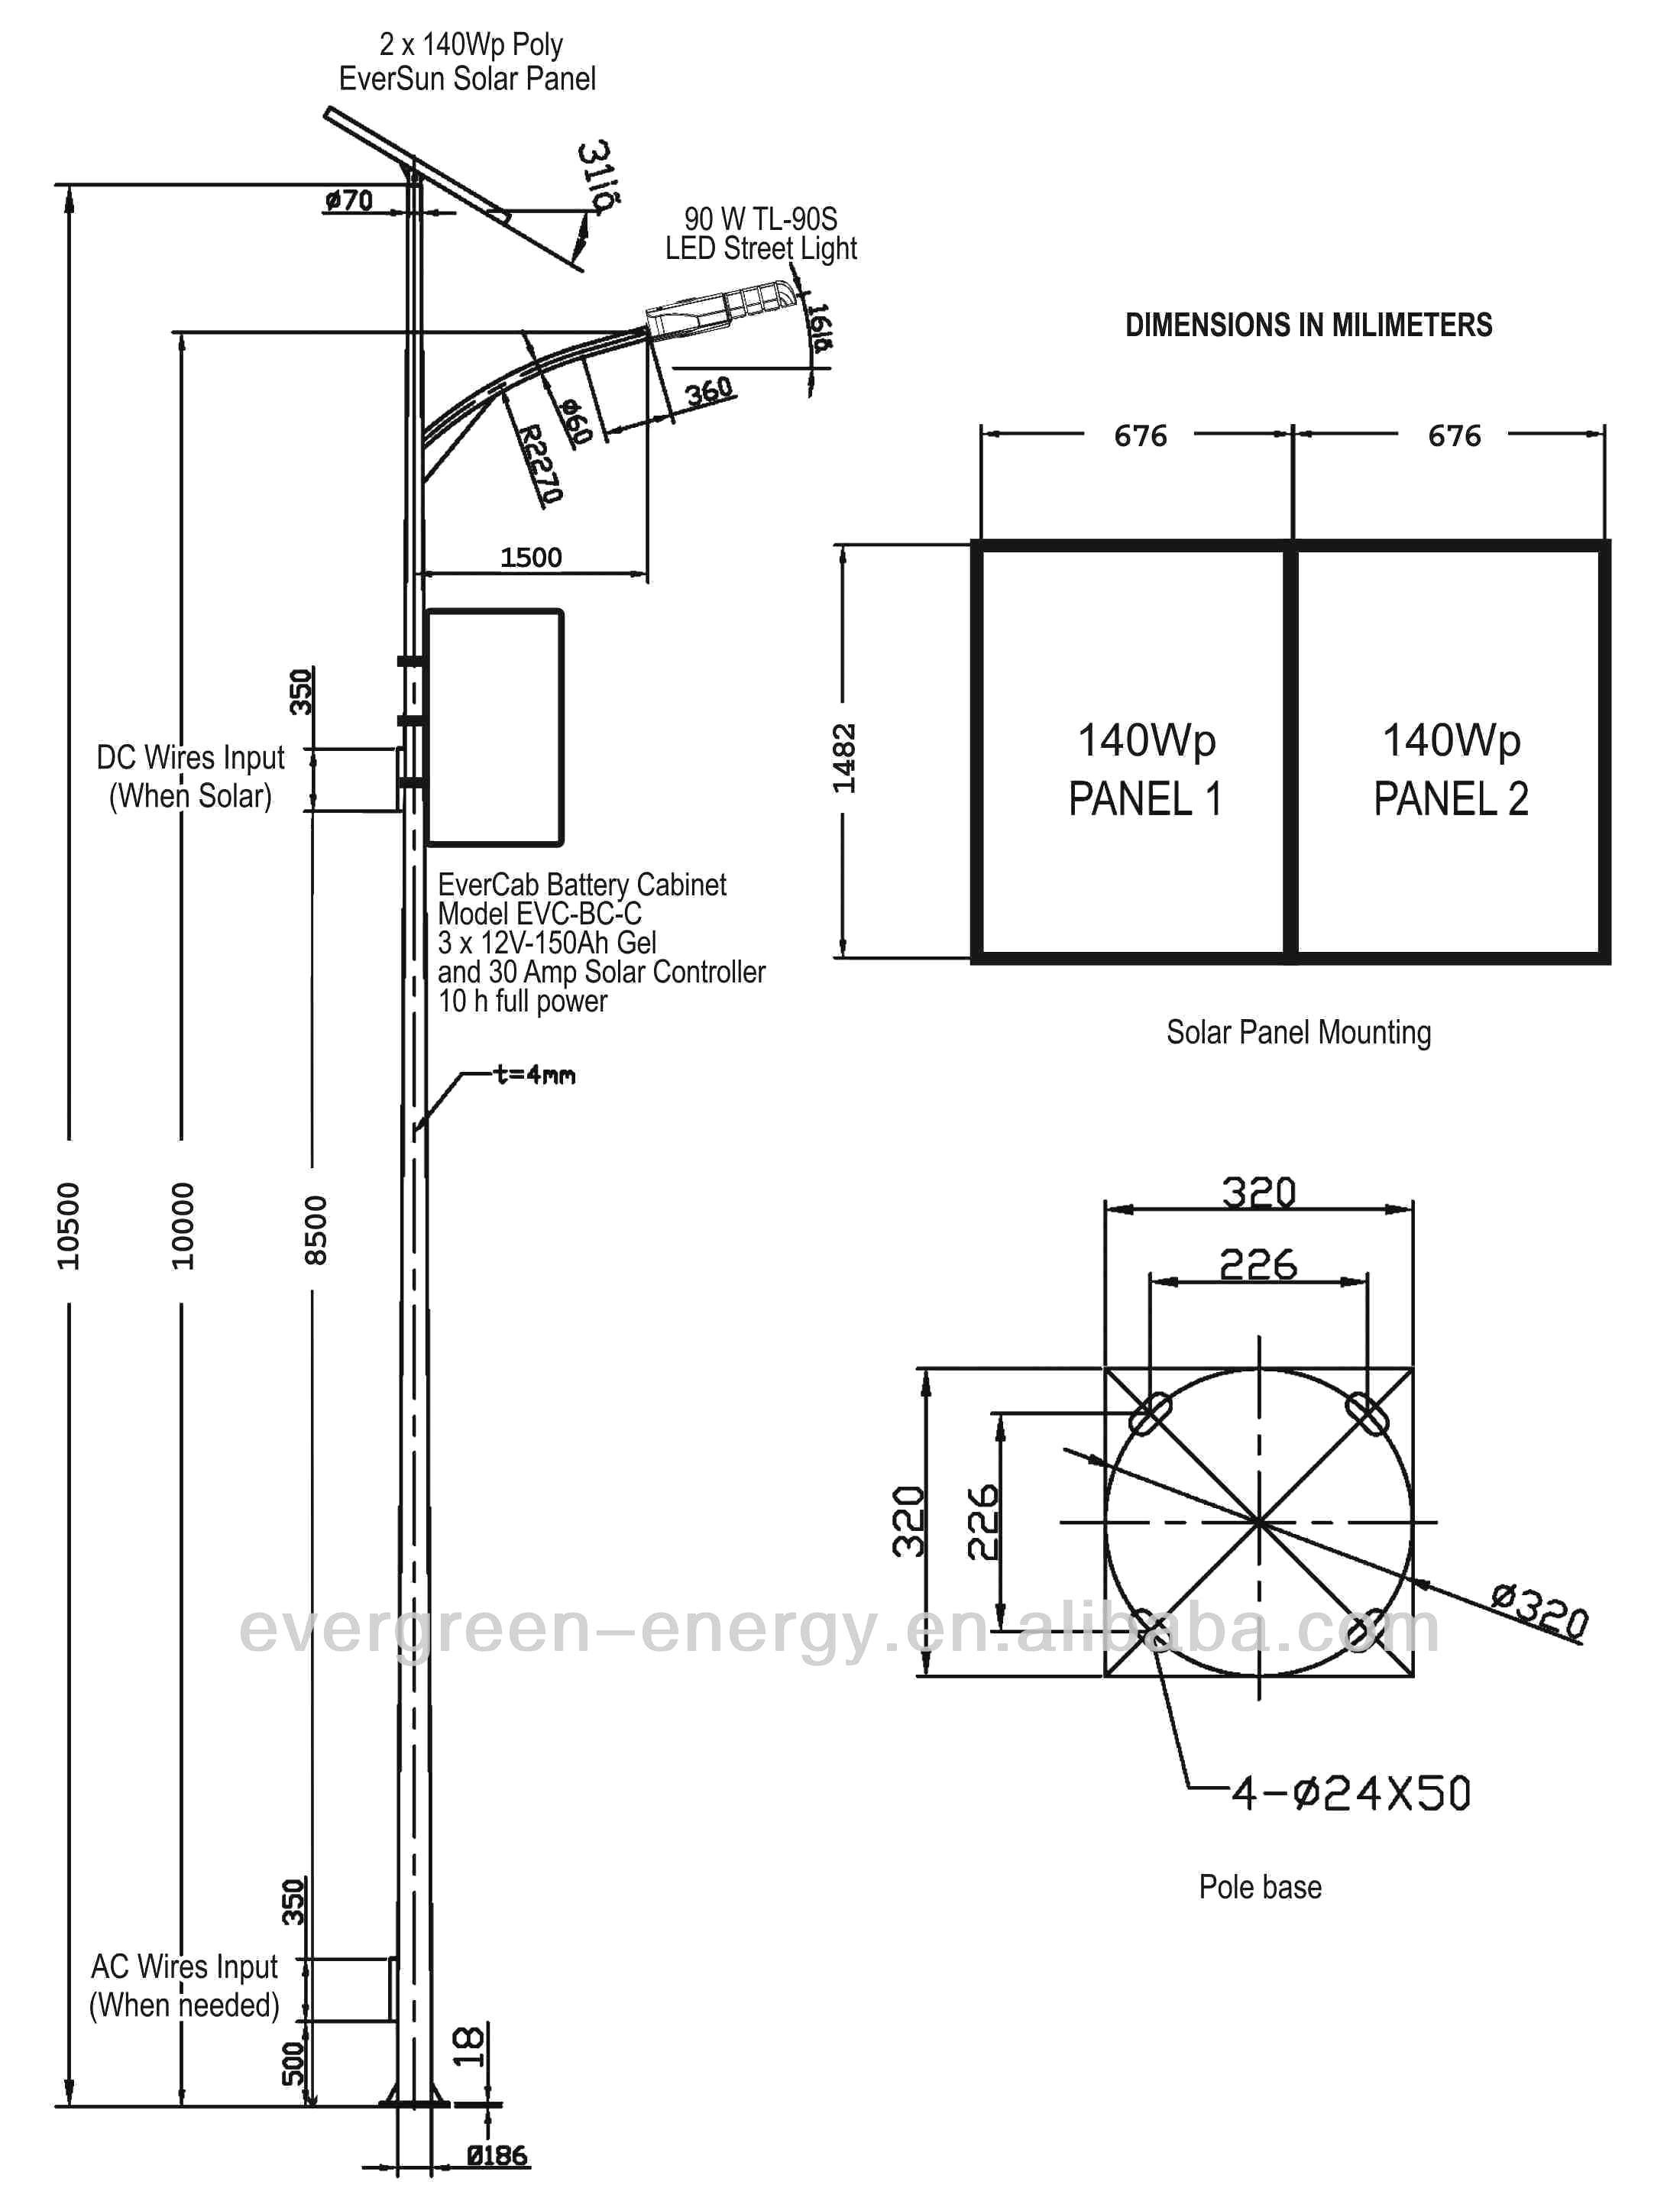 Solar Led Light Circuit Diagrams solar Powered Street Light Circuit Diagram Craluxlighting